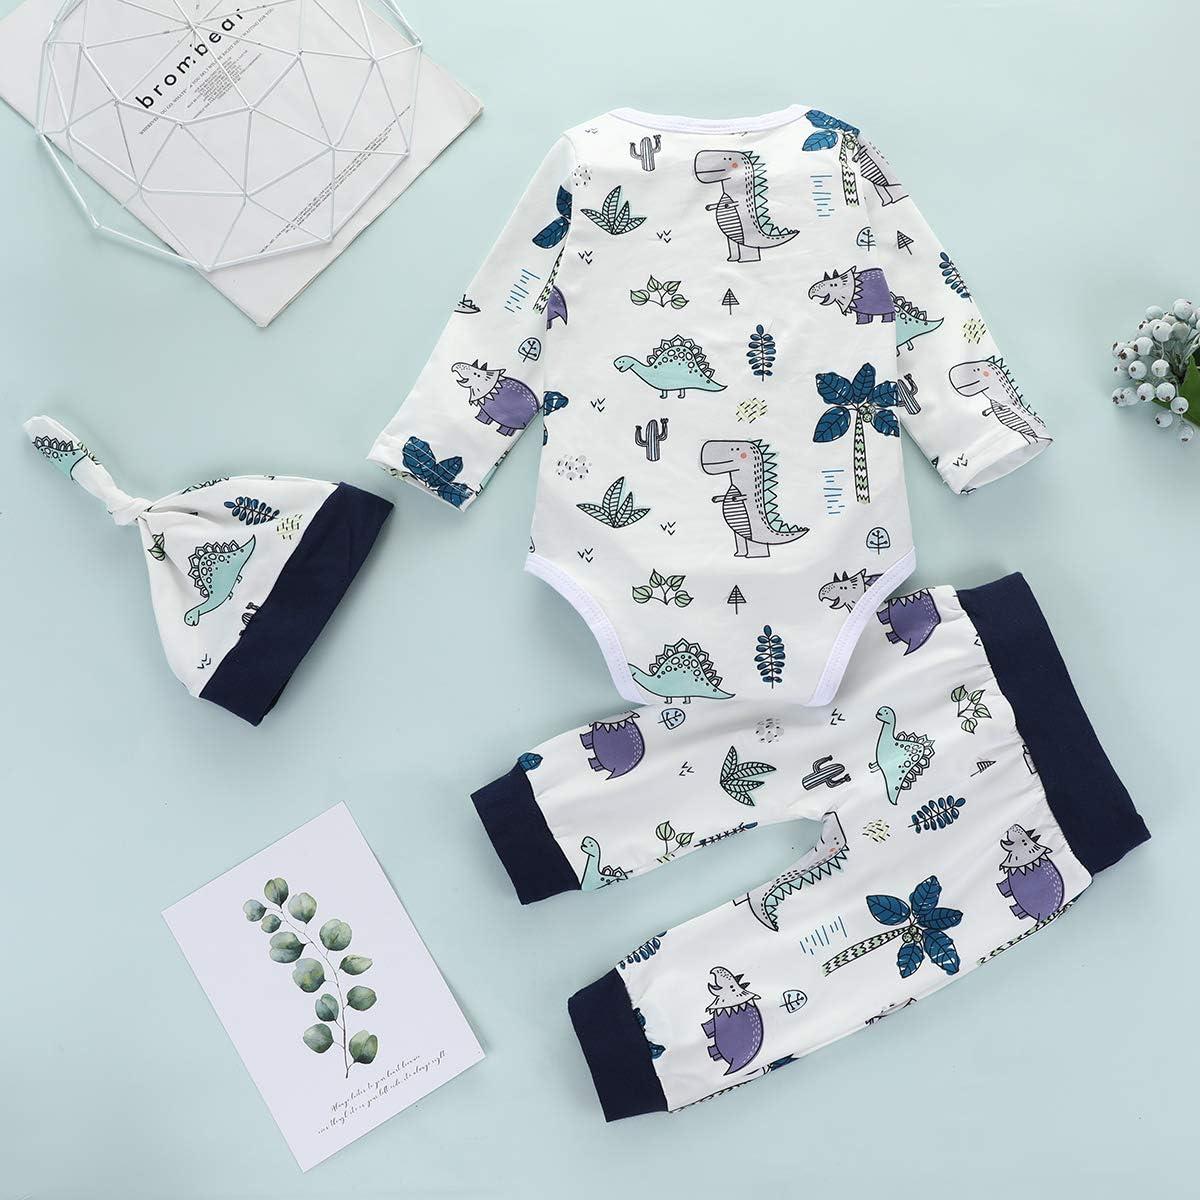 3Pcs Newborn Baby Boy Clothes Dinosaur Printed Long Sleeve Romper Warm Long Pants Set Hat Outfits